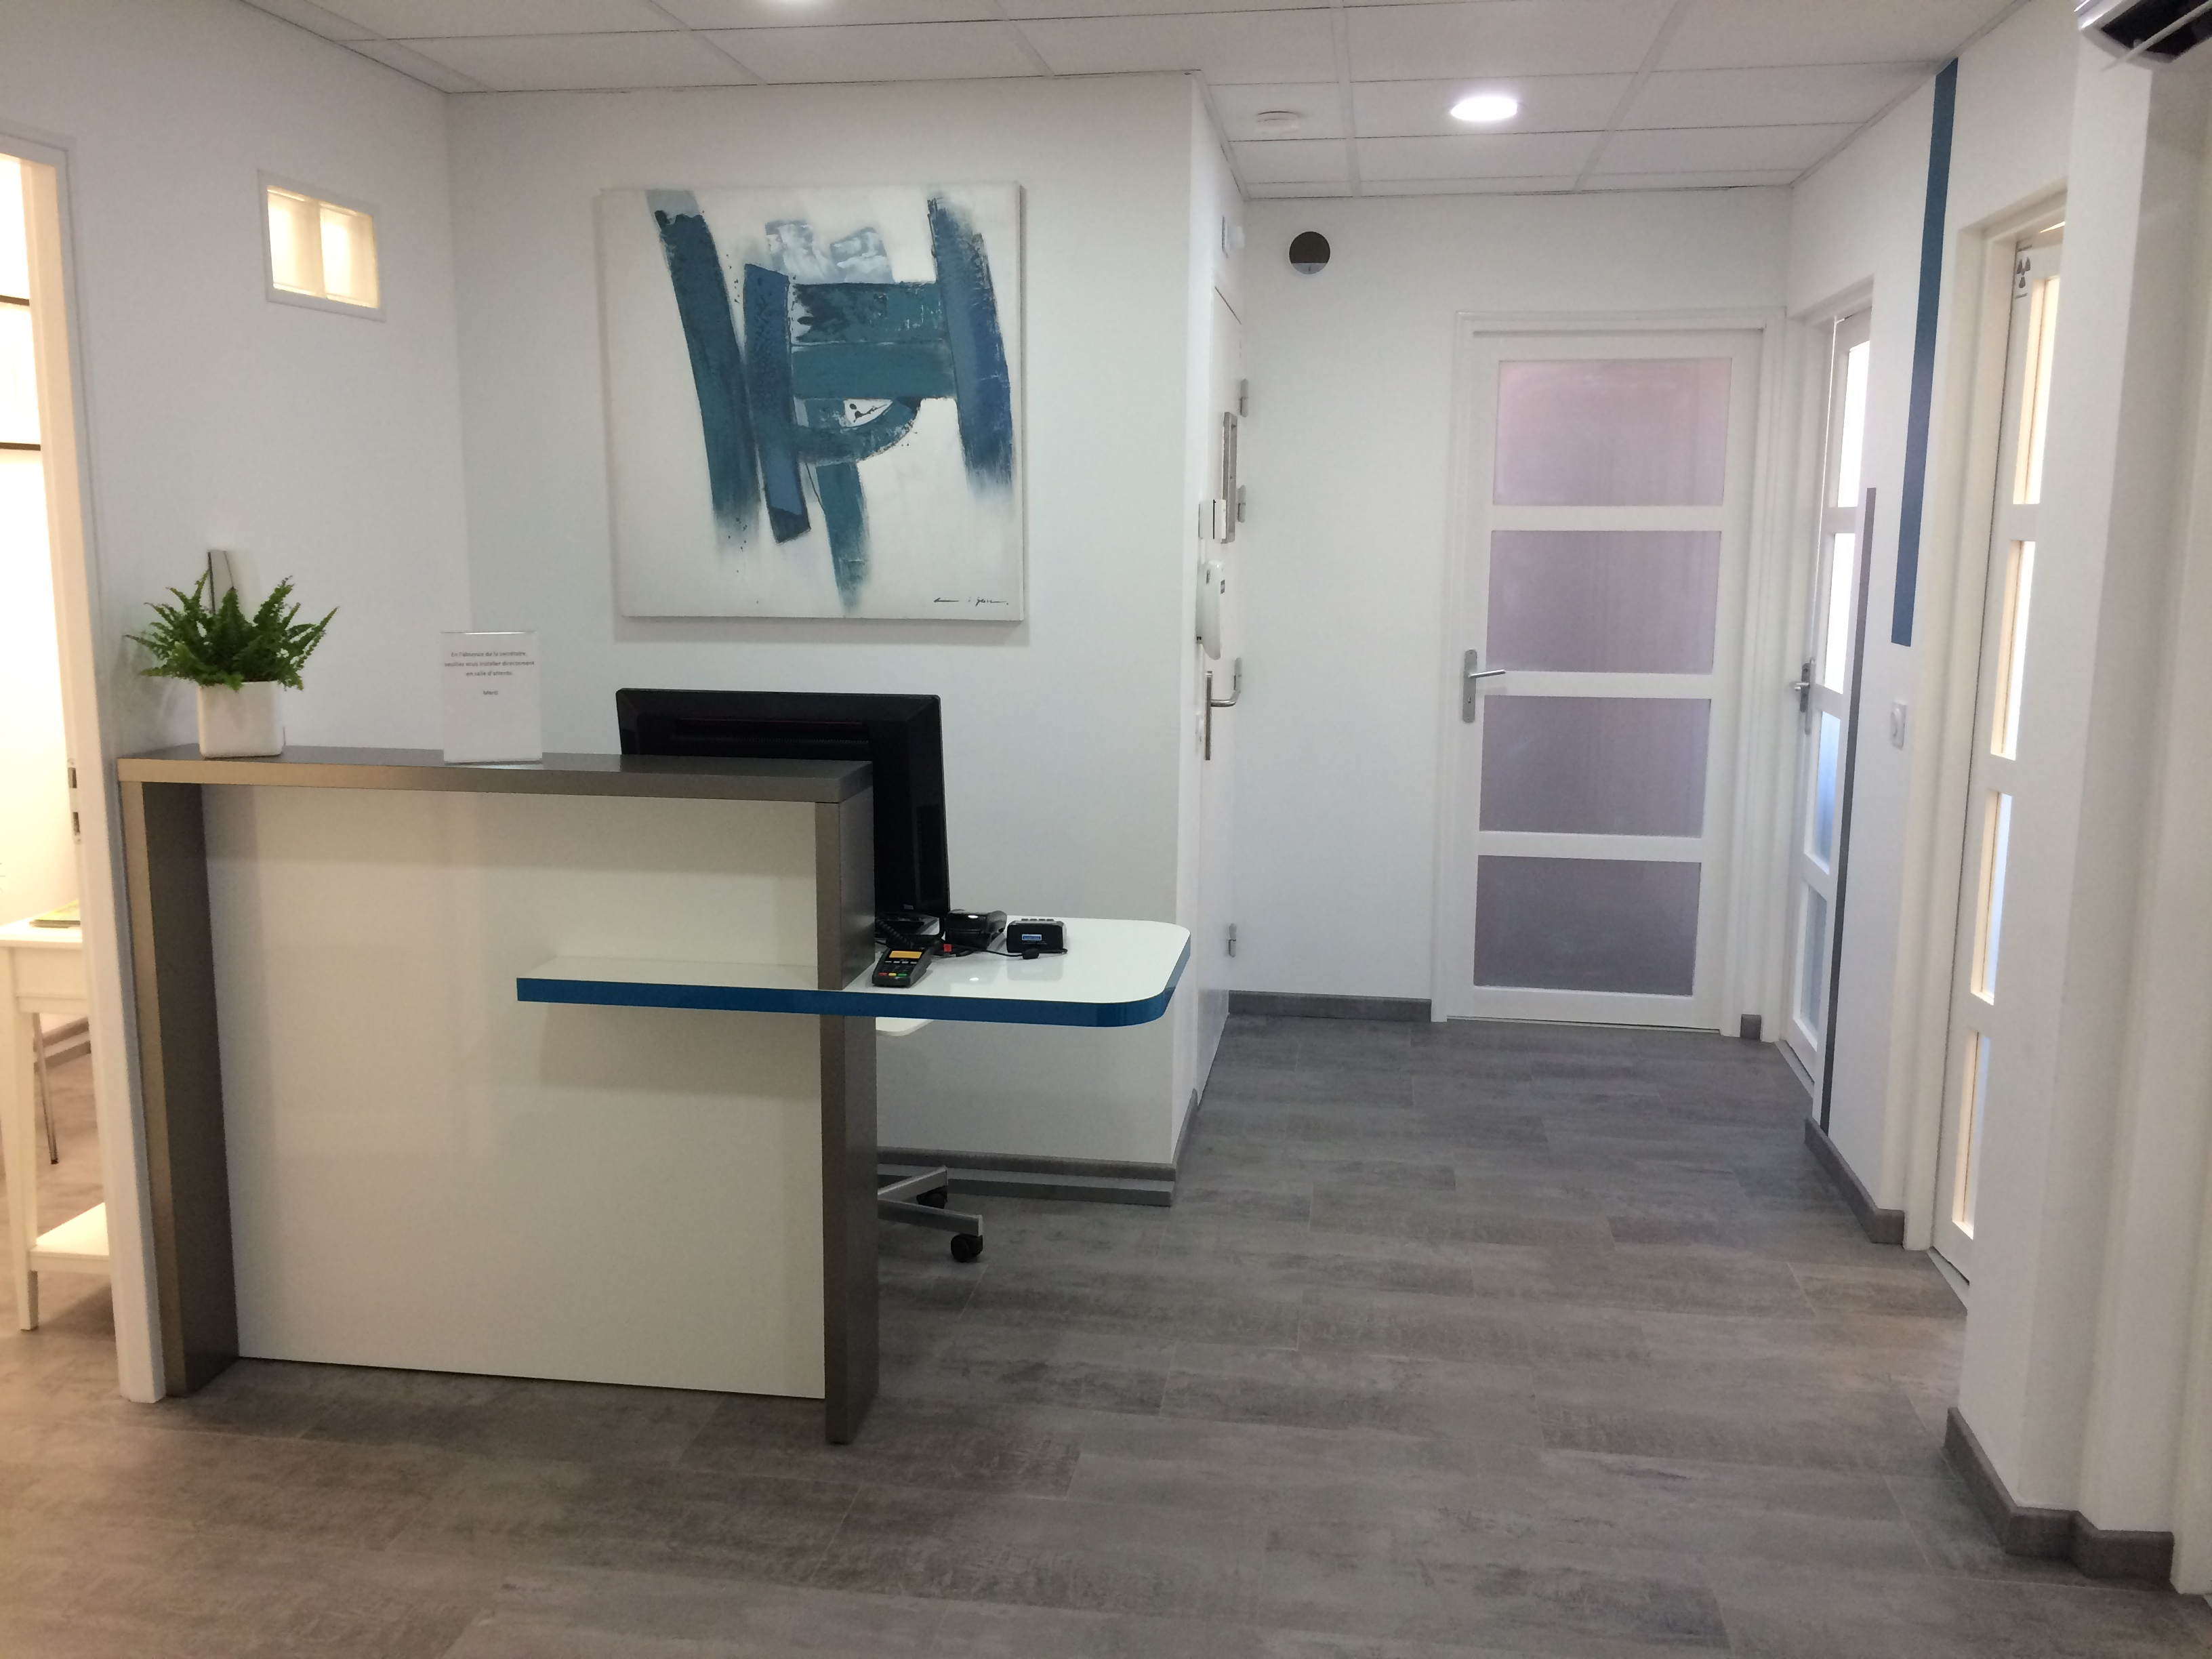 parodontologie salon de provence